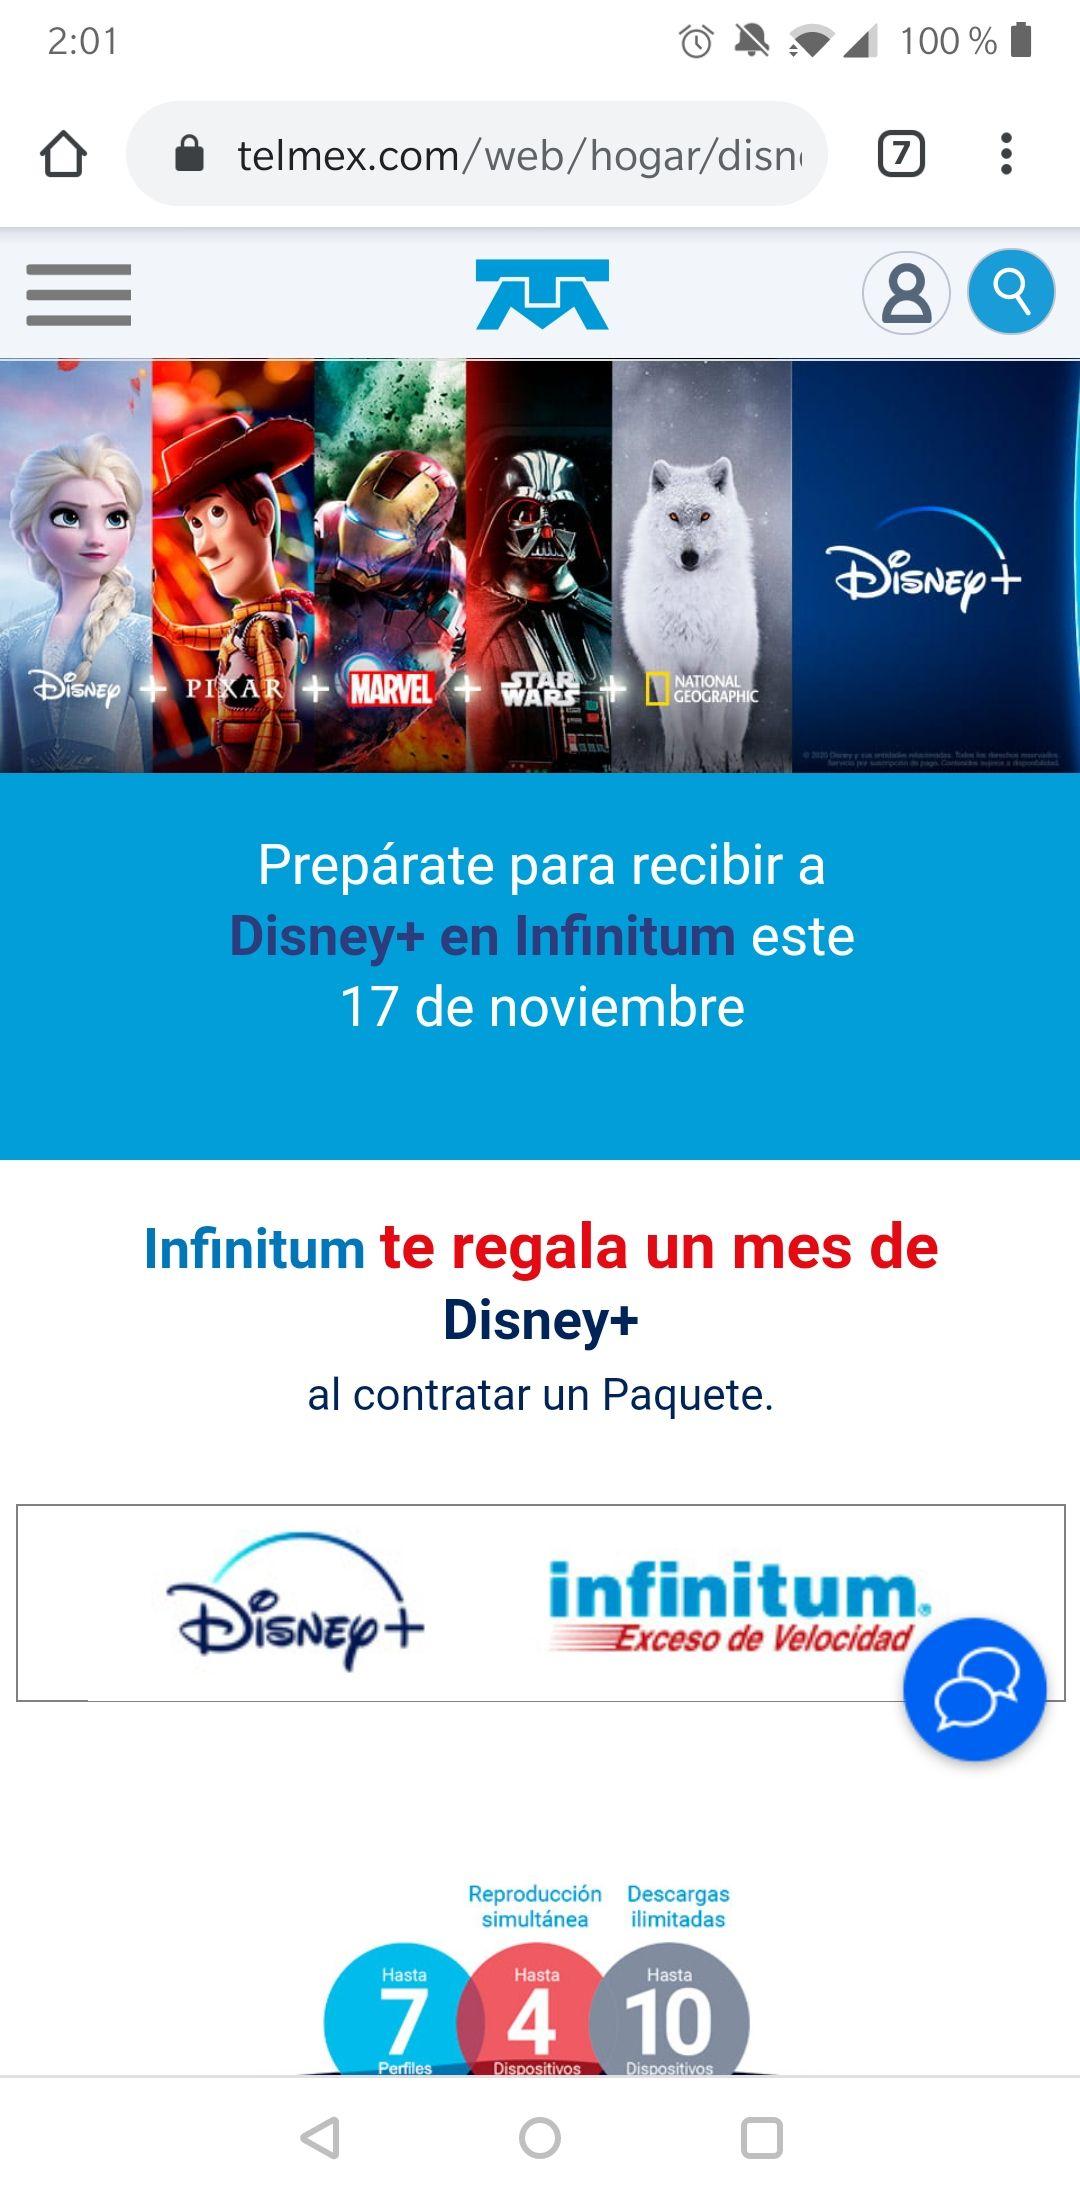 1 mes de Disney Plus gratis al contratar un paquete Infinitum Telmex